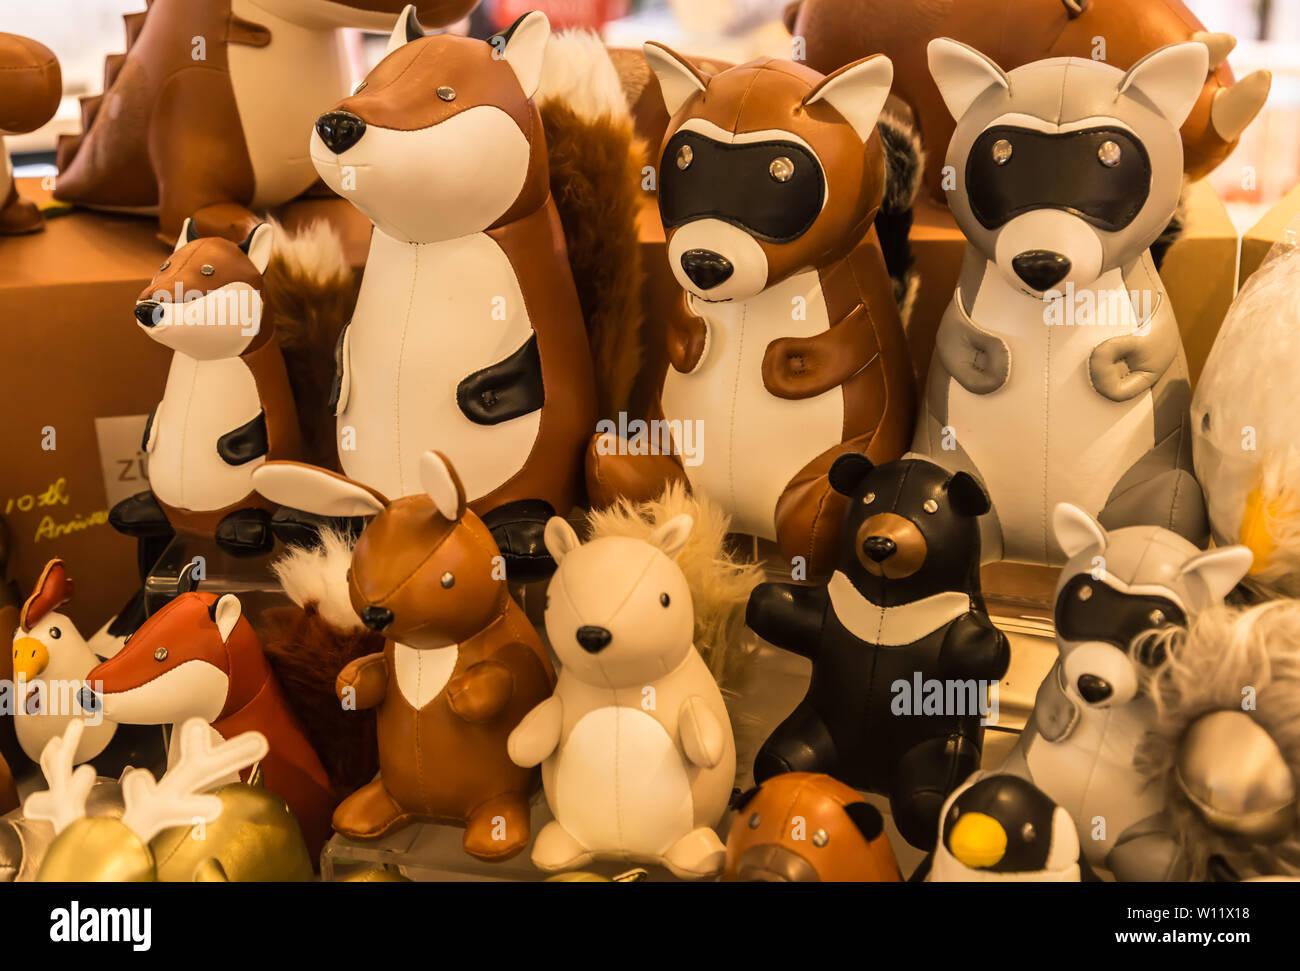 Taiwan,Taipei-05 SEP 2017: the leather animal toy display on shelf on sale - Stock Image